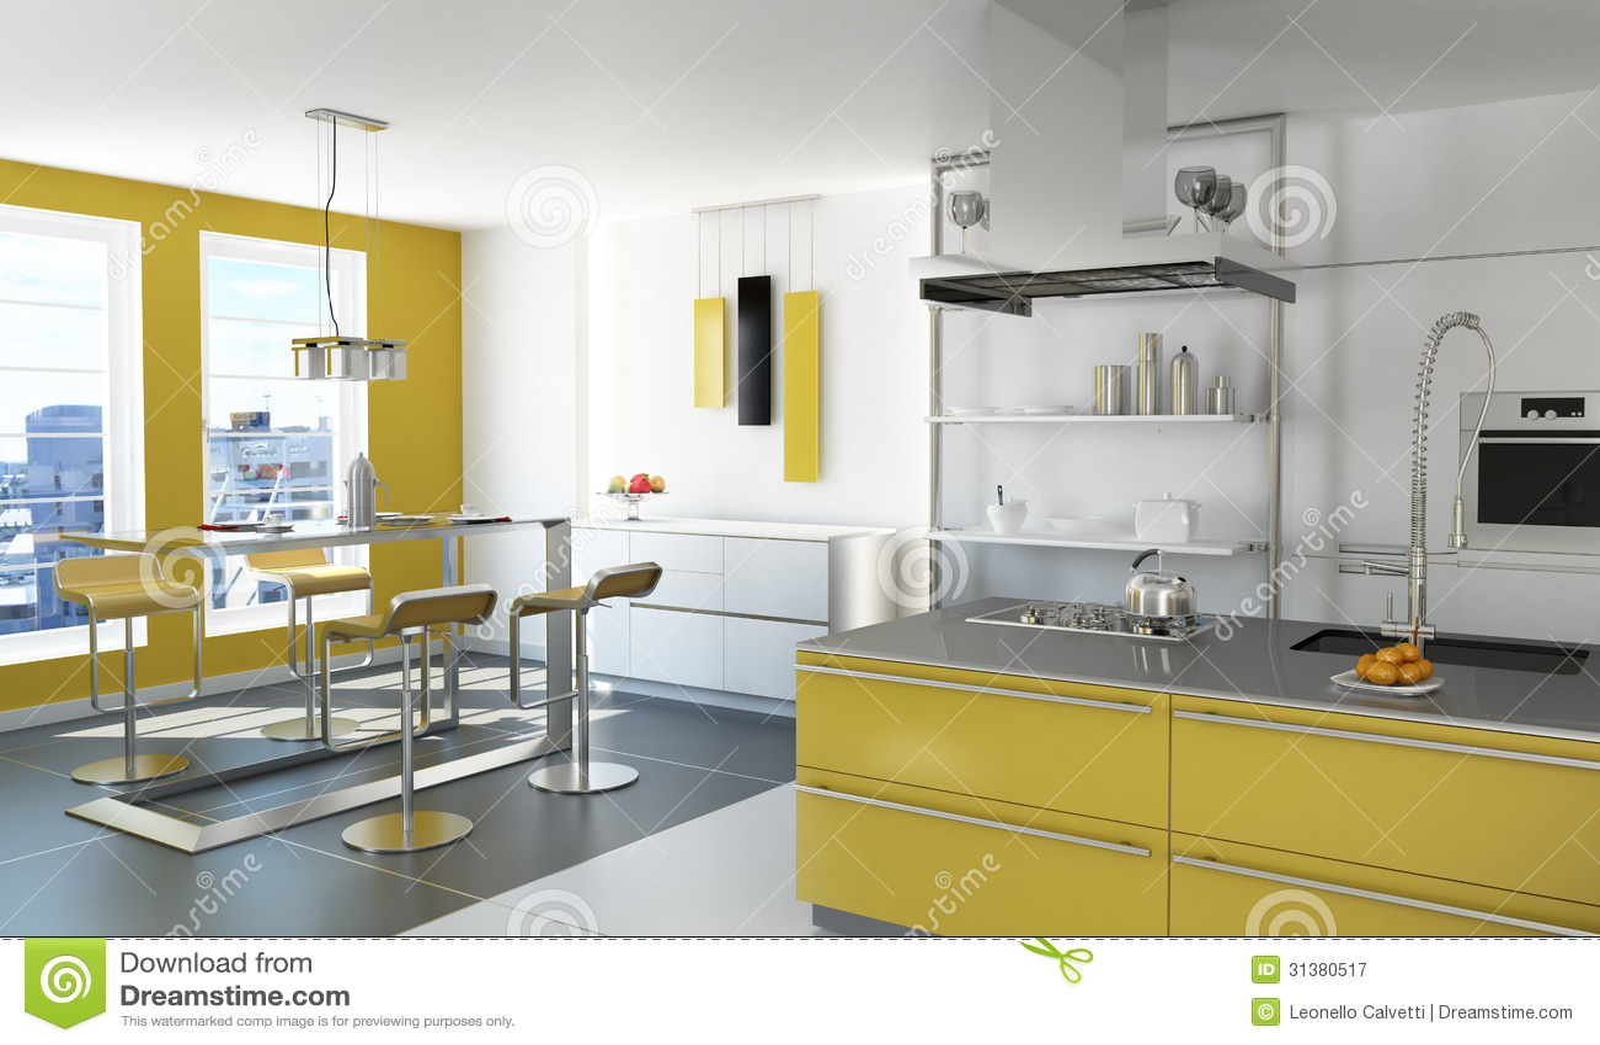 Cucina Gialla Moderna. Fotografia Stock Libera da Diritti - Immagine: 31380517